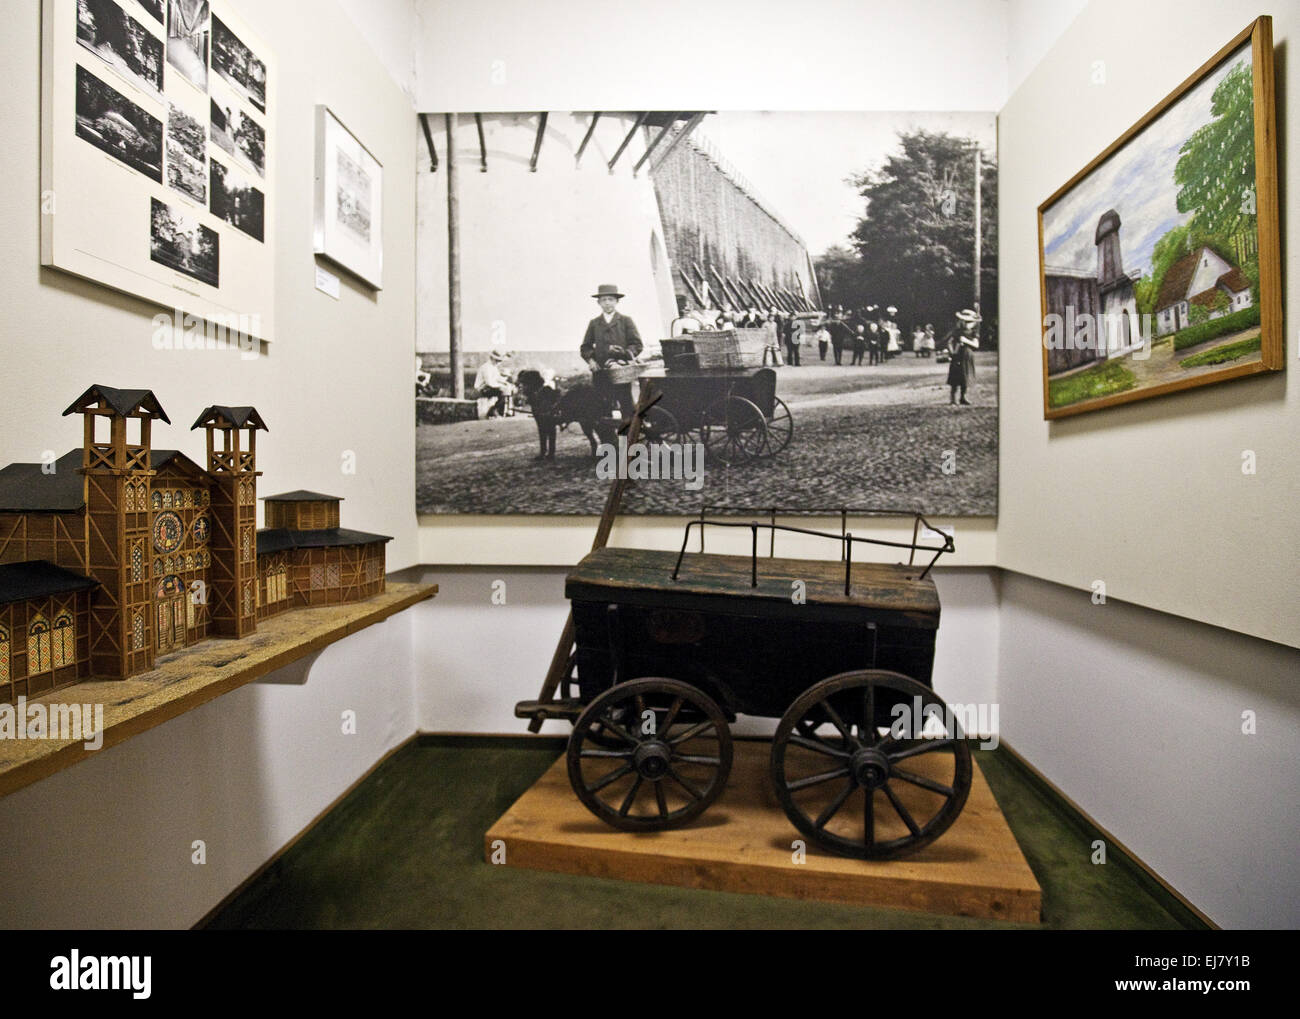 Hellweg Museum exhibition, Unna, Germany - Stock Image